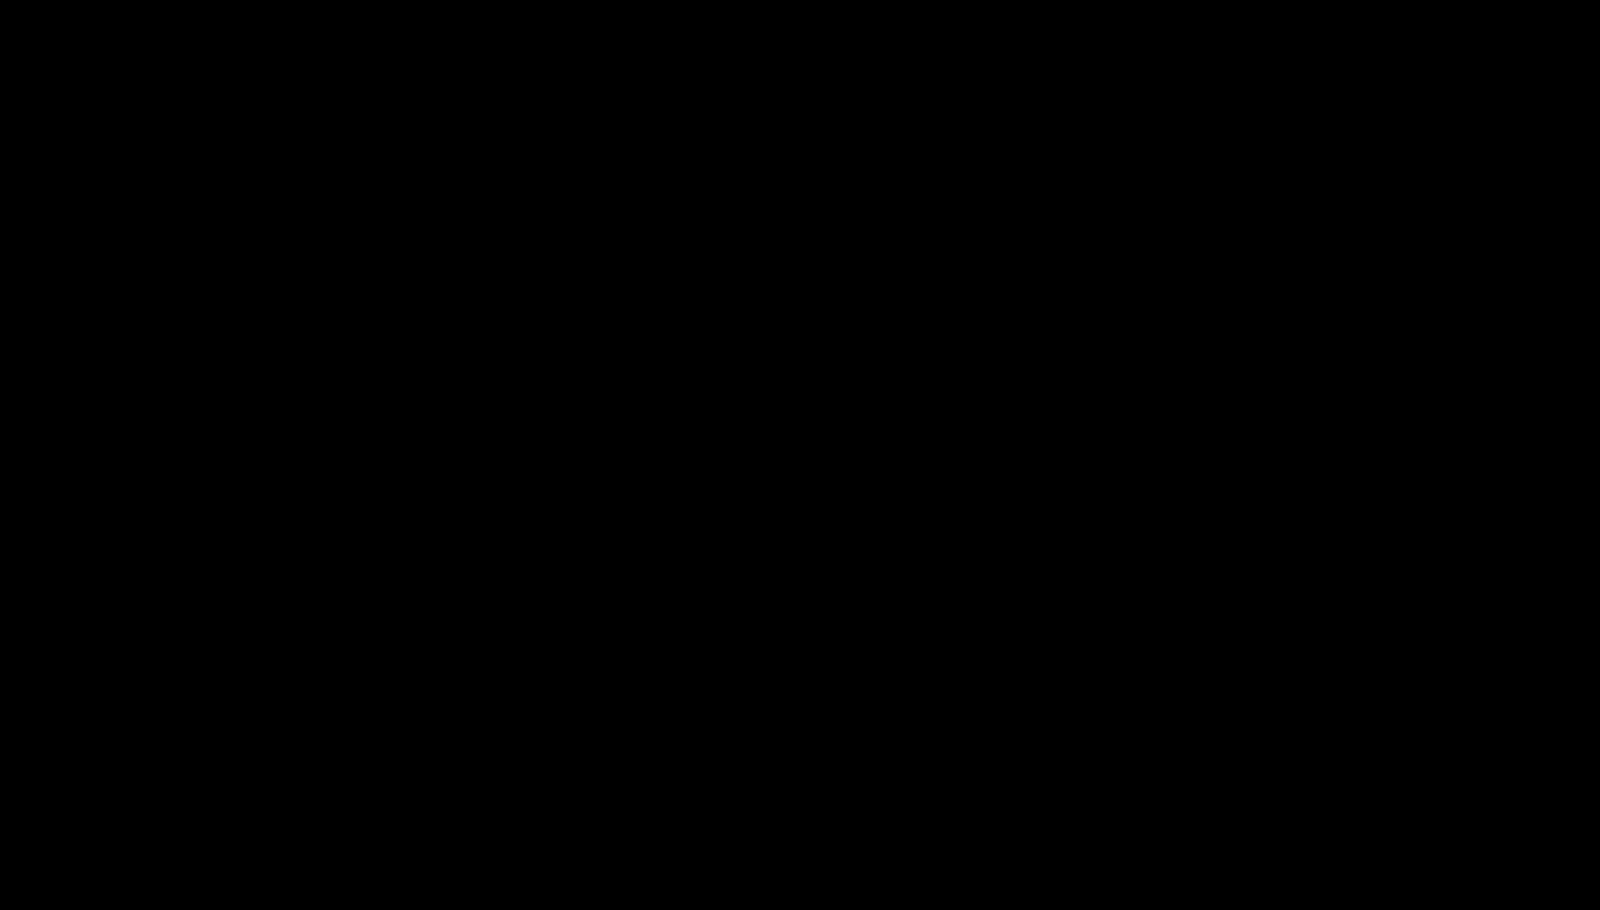 logo-edls19